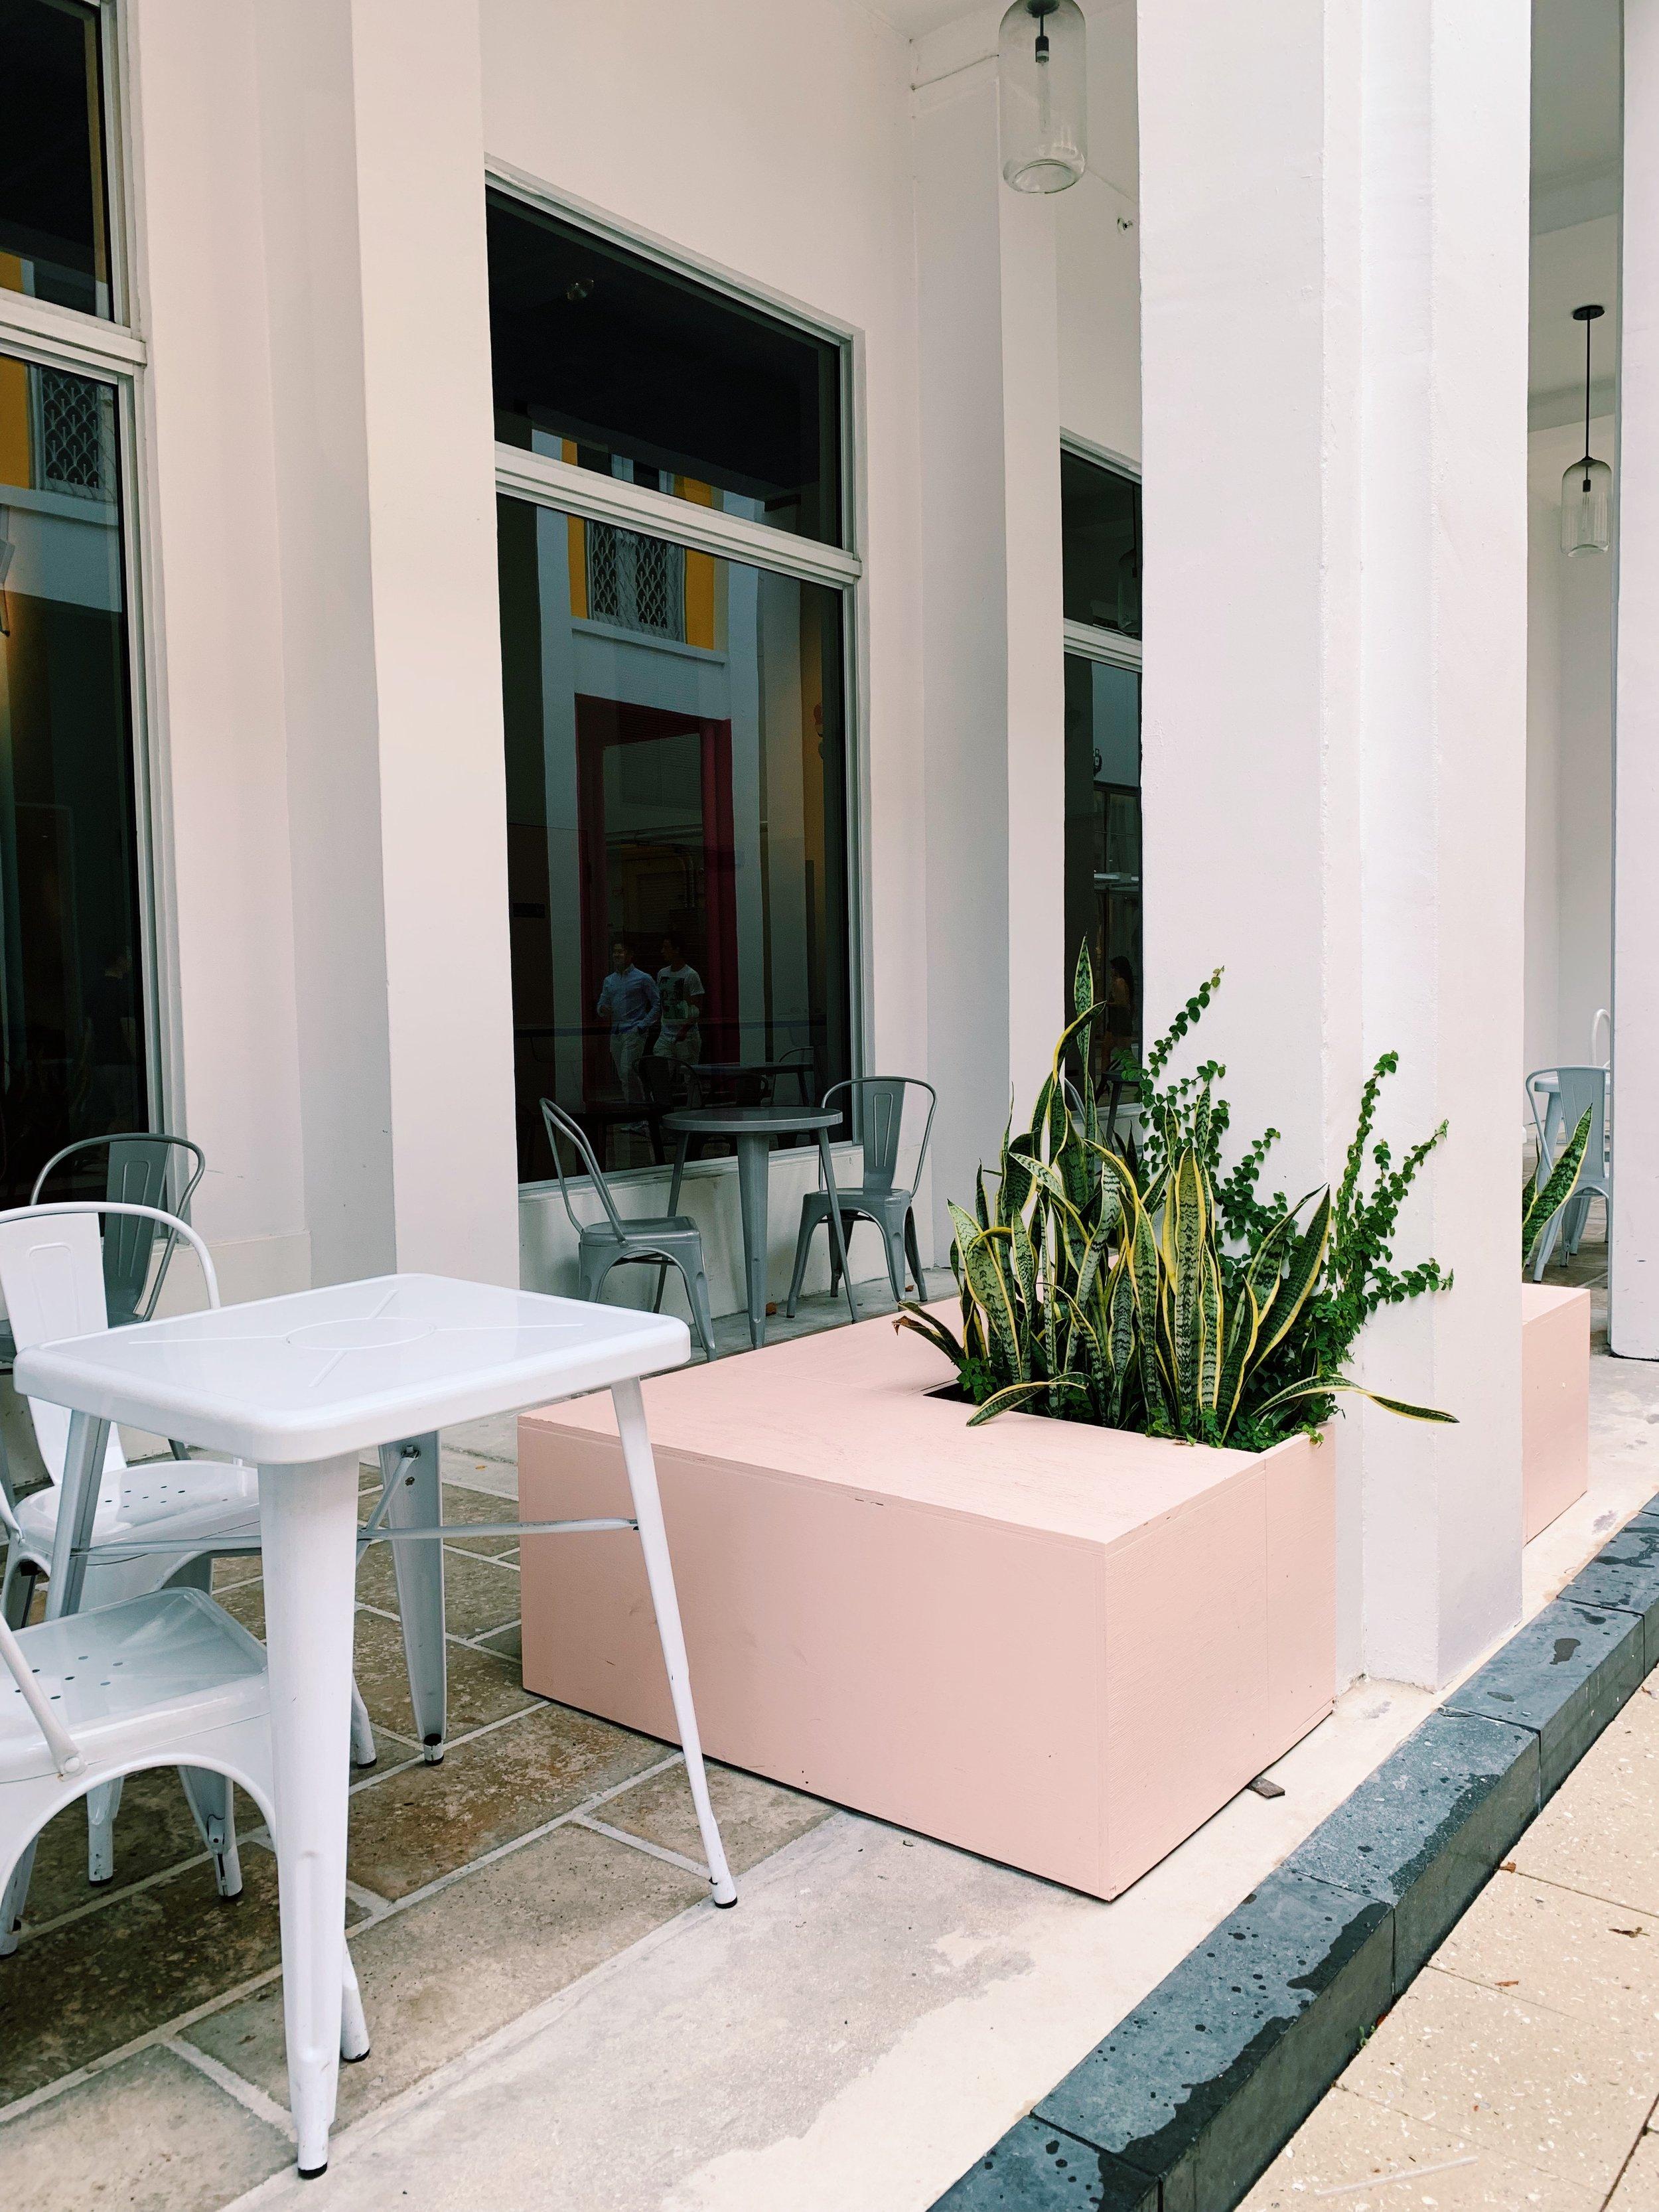 A more understated palette | Miami Design District